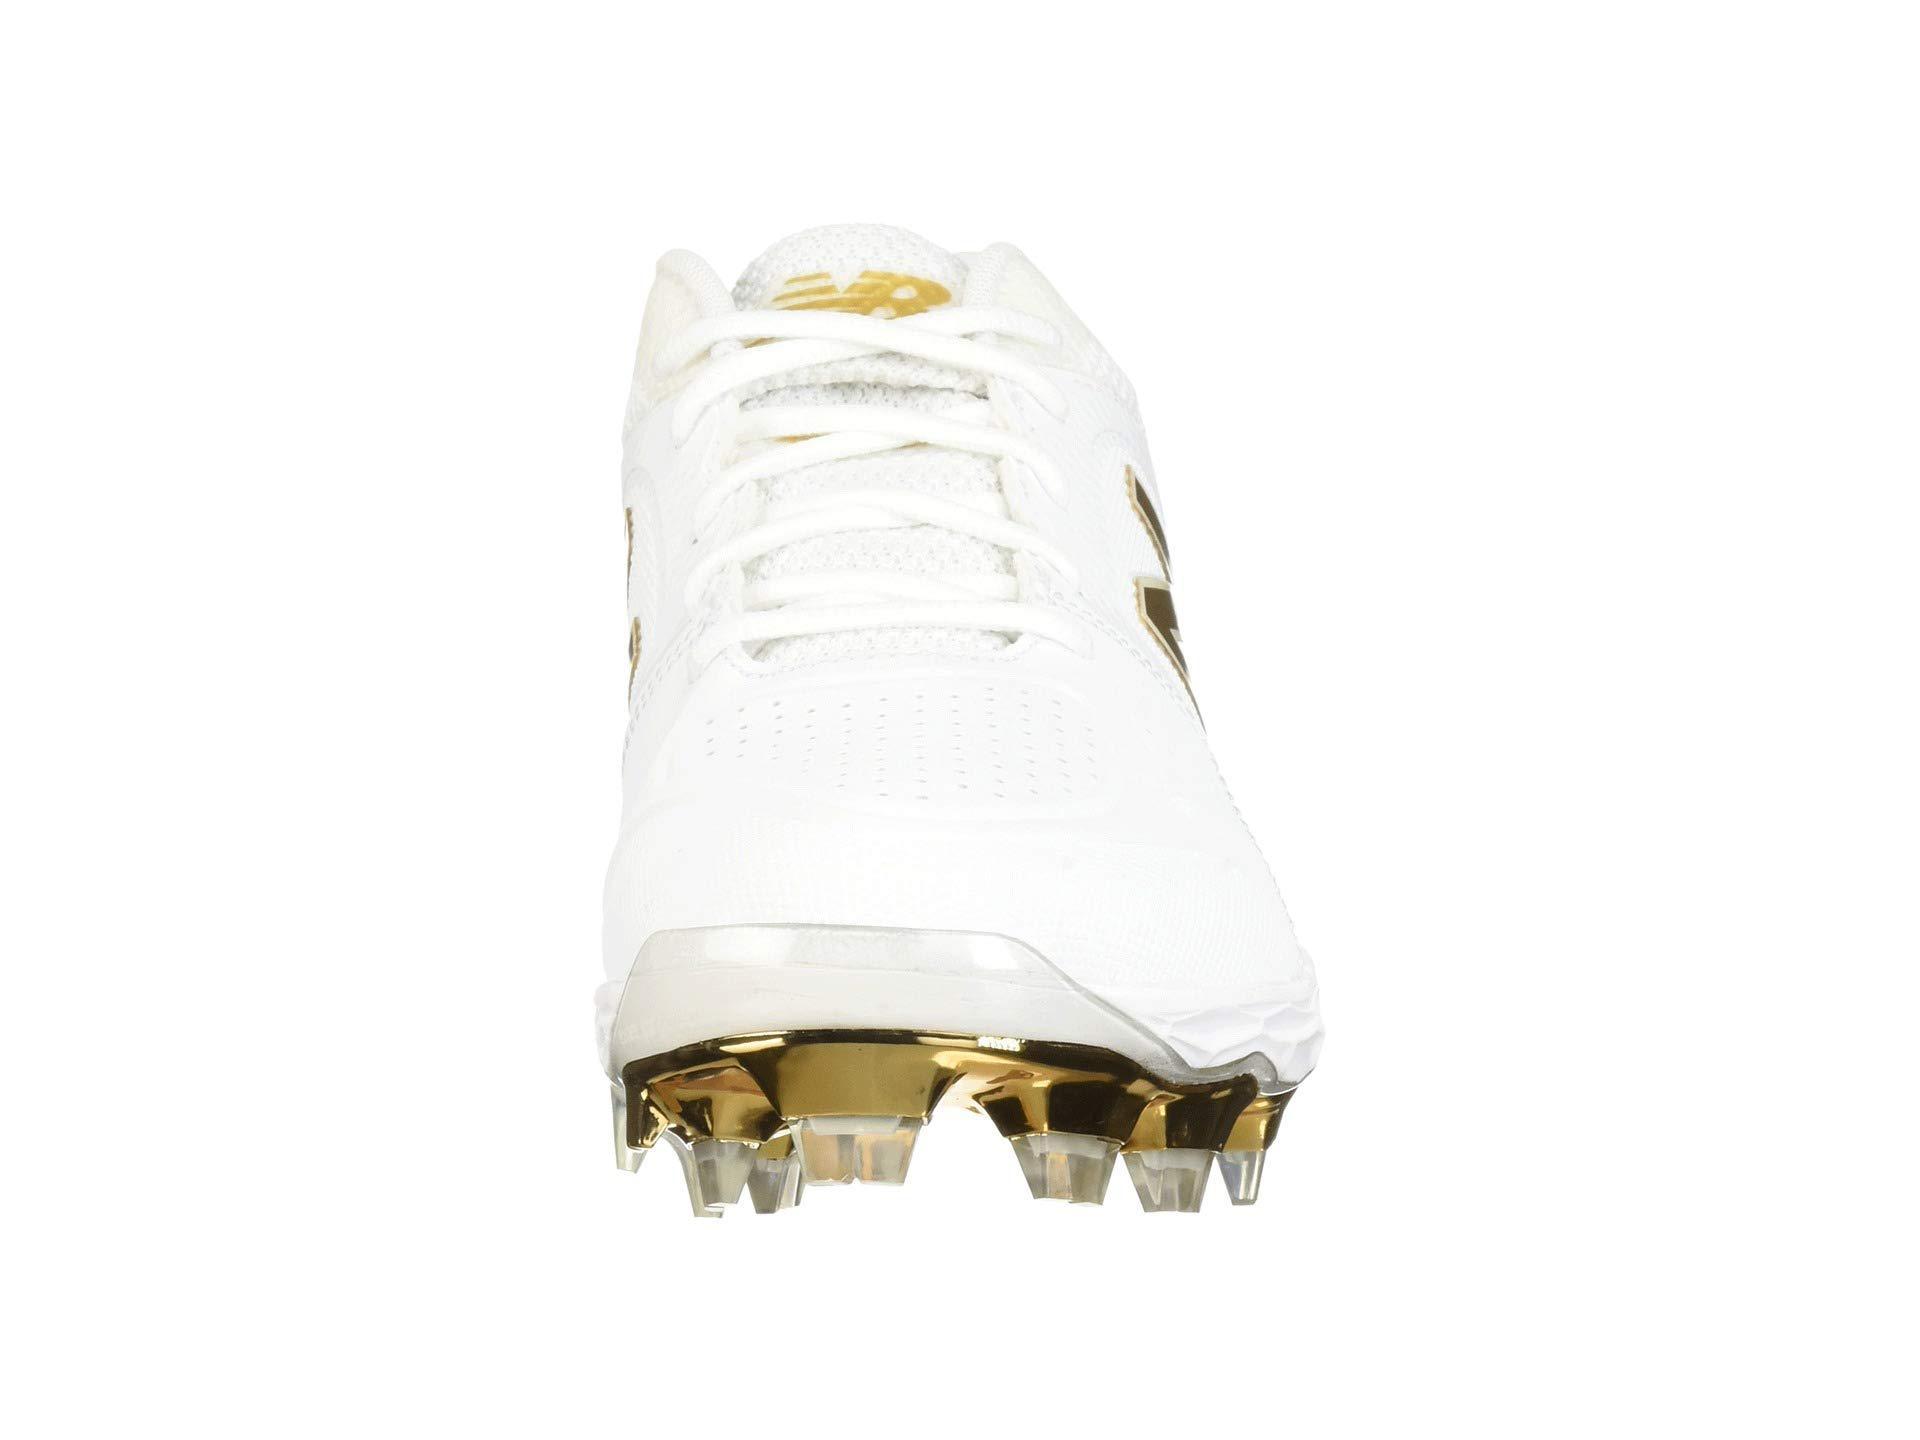 buy online f09e1 78b91 Lyst new balance fresh foam spvelov white gold womens cleated jpg 1920x1440  Gold softball cleats